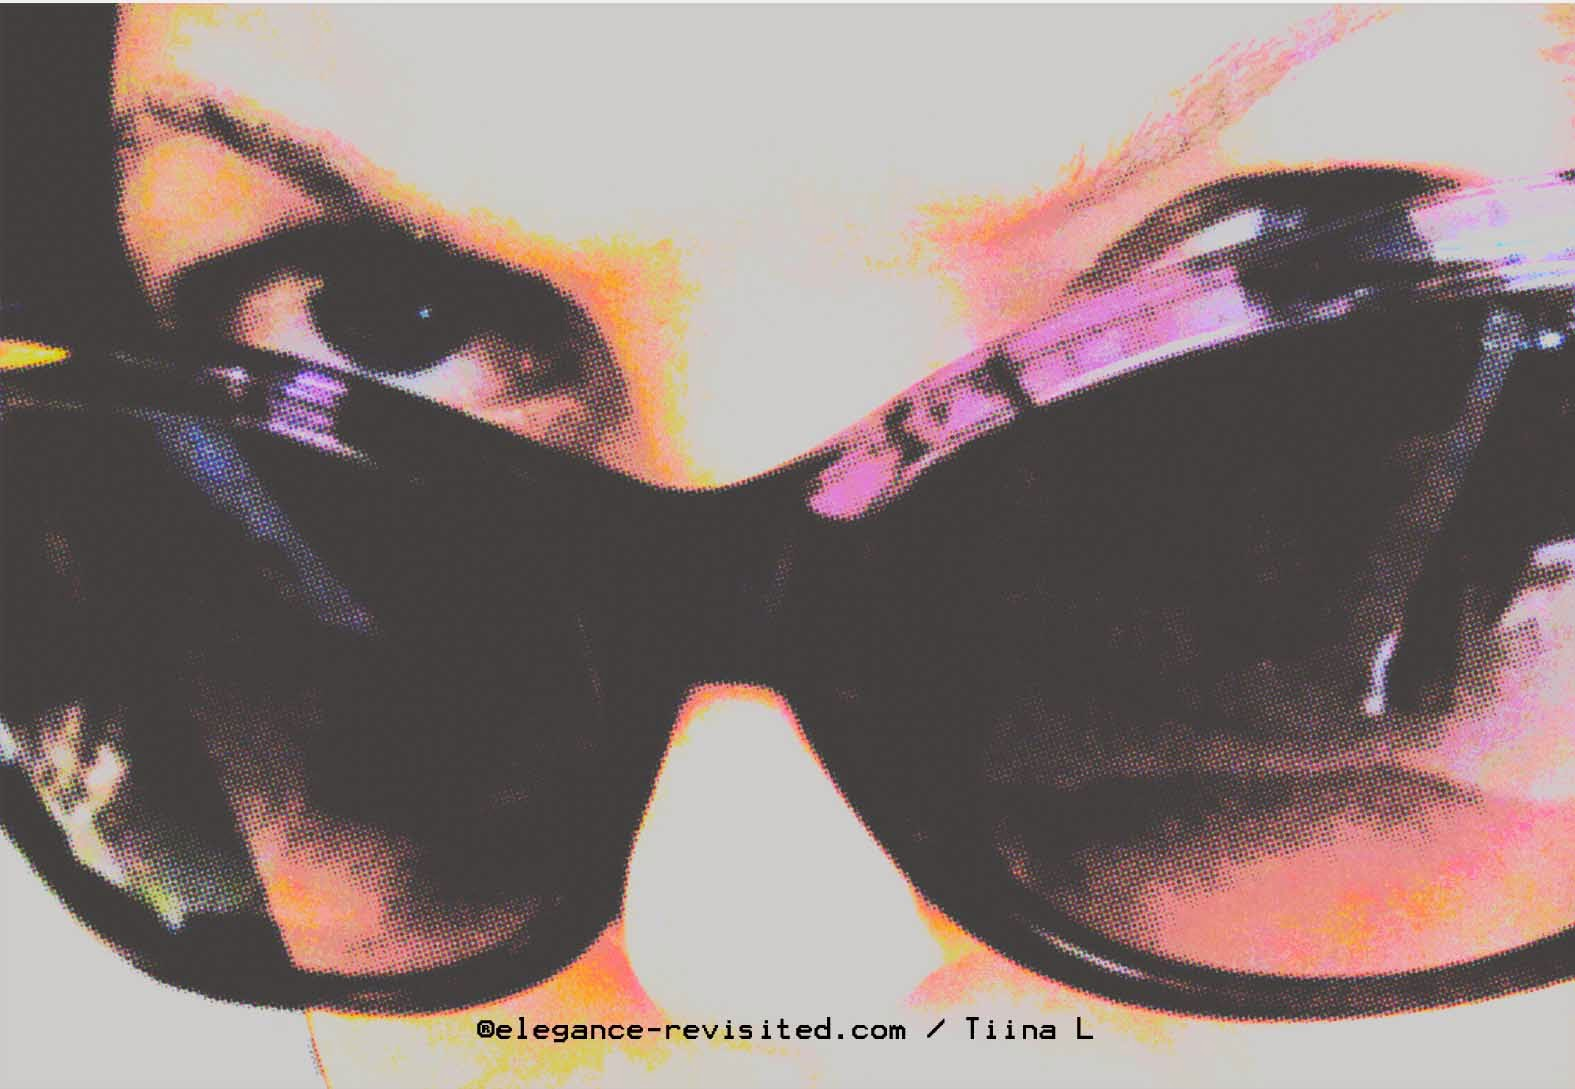 photomanipulation elements 10